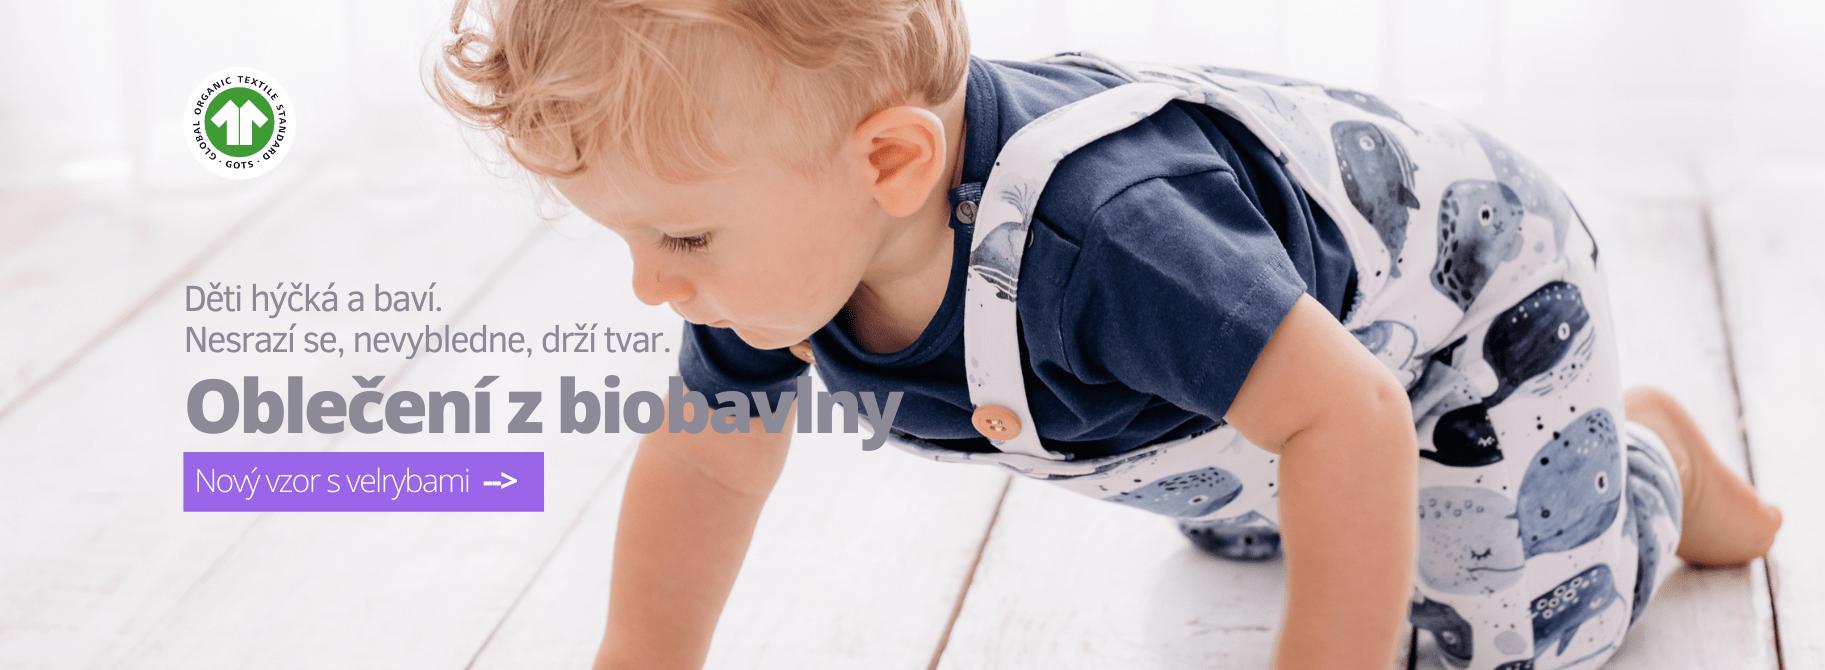 Dětské a kojenecké oblečení z biobavlny - nový vzor s velrybami